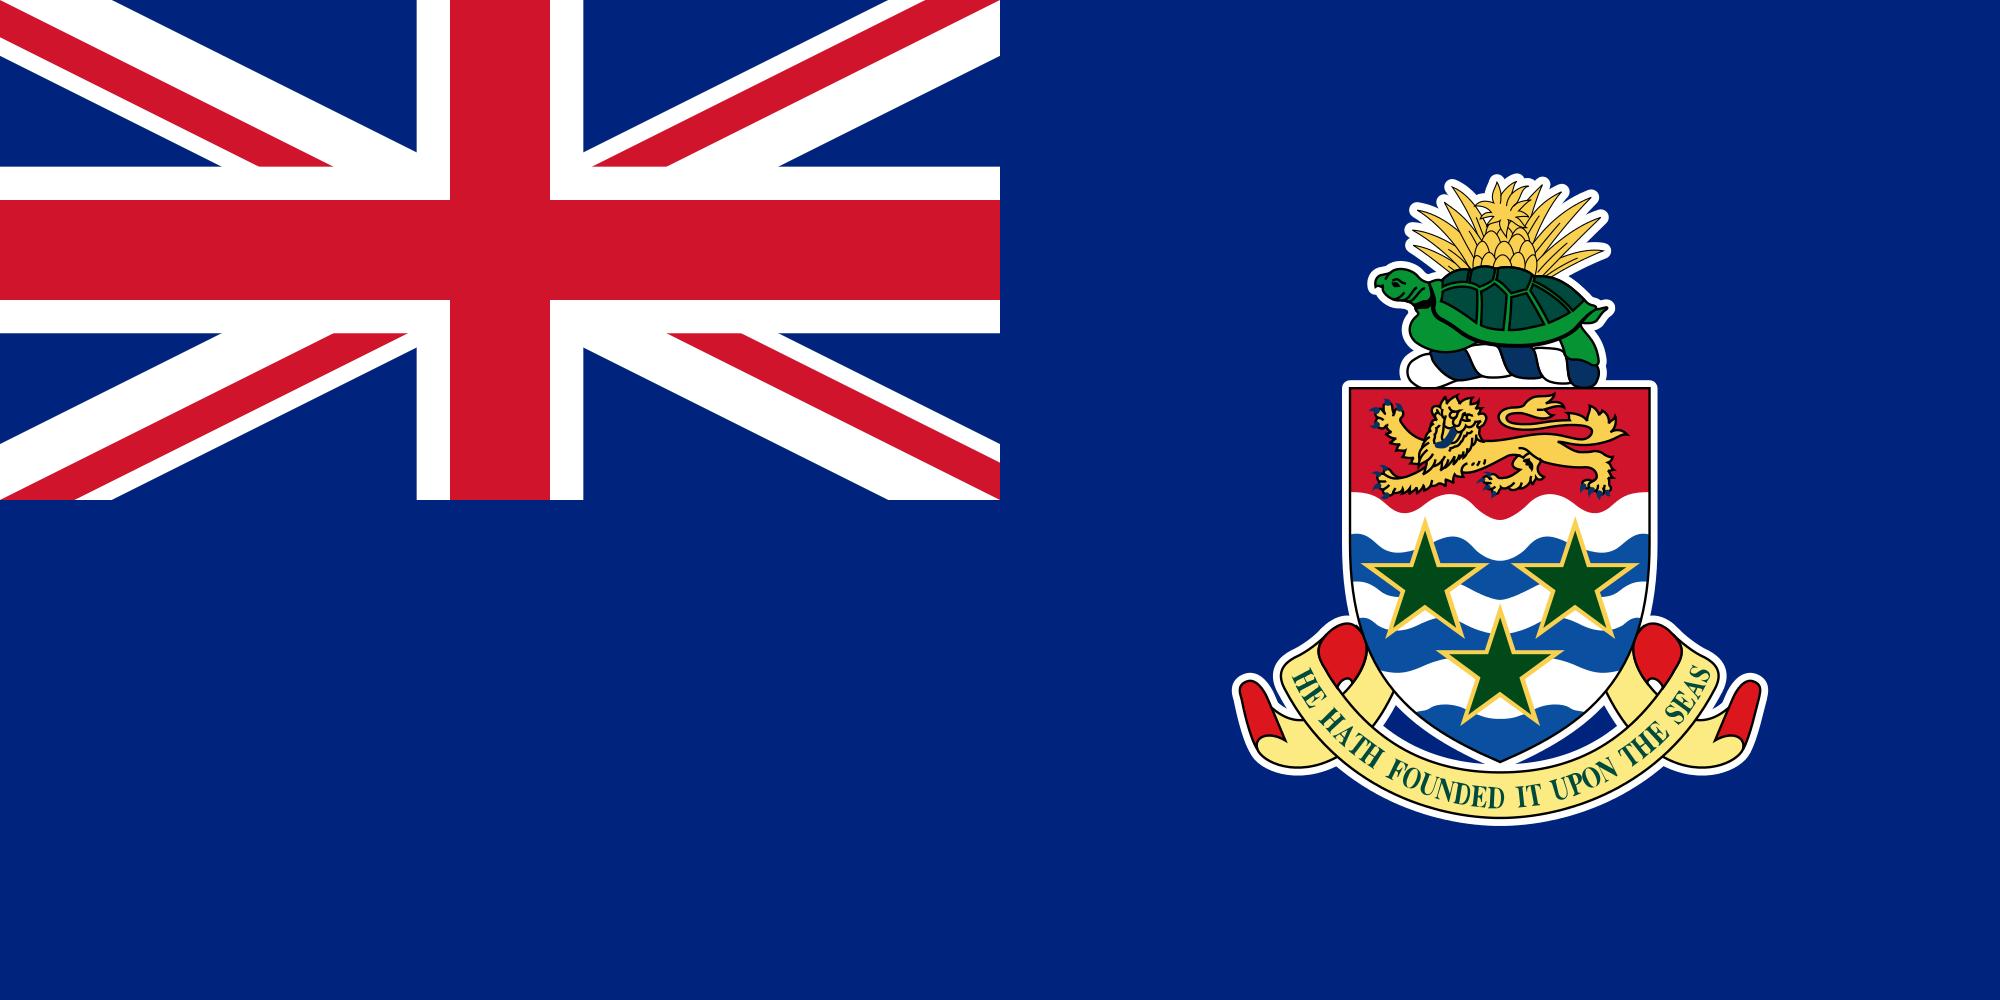 islas caimán, país, emblema, insignia, シンボル - HD の壁紙 - 教授-falken.com